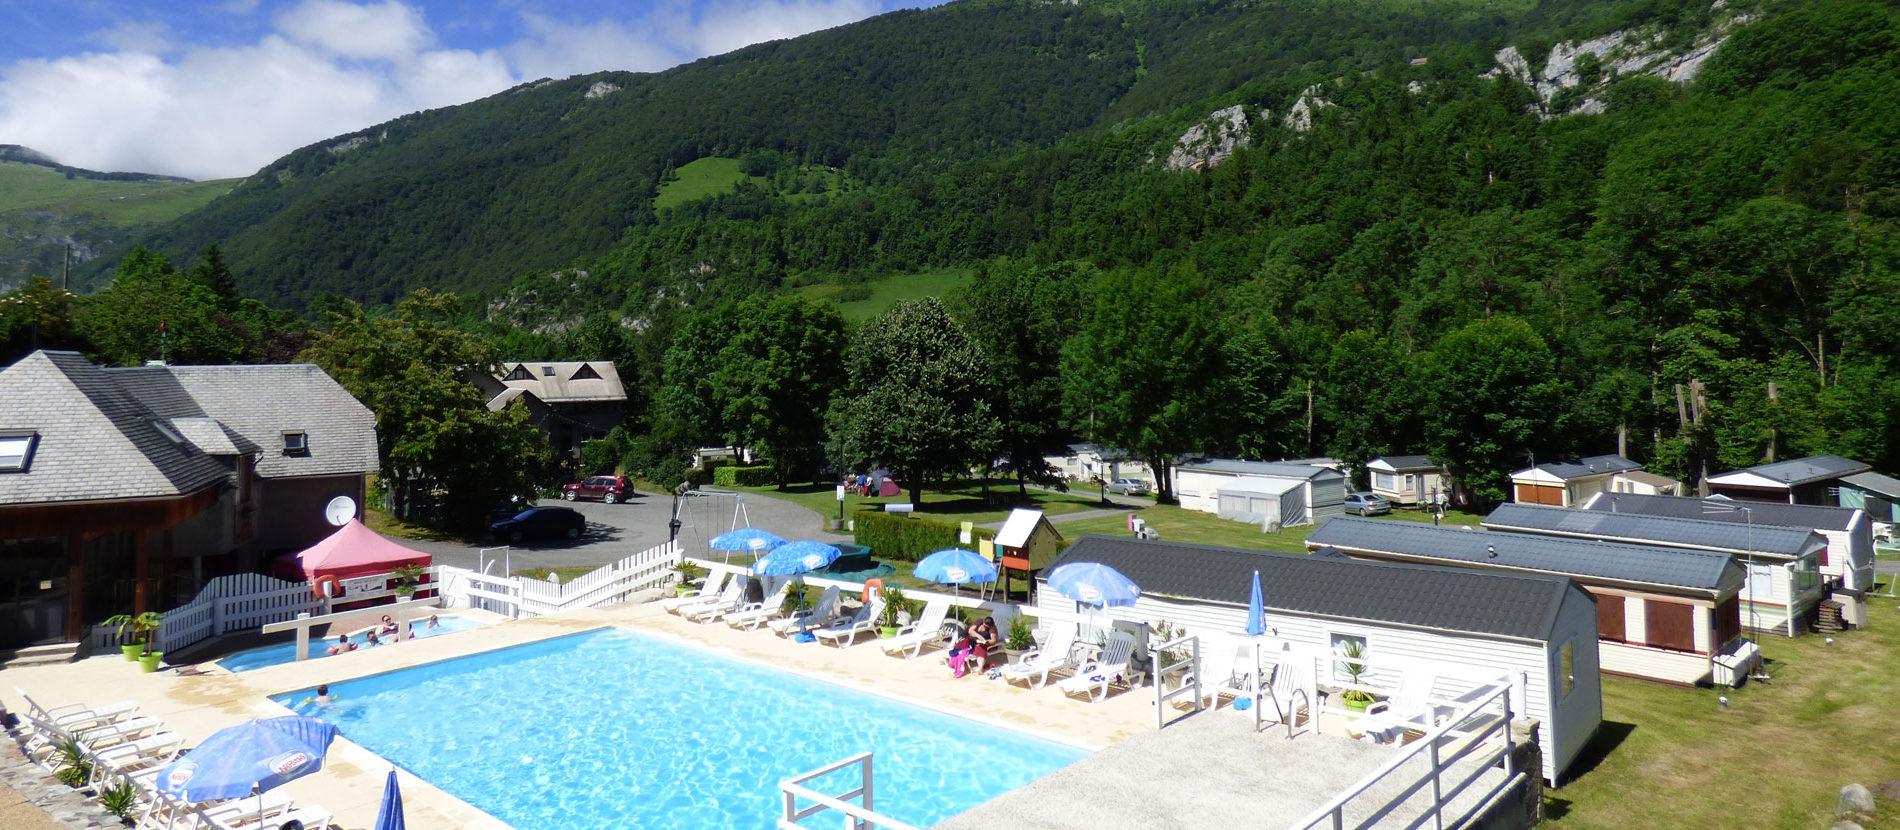 Camping hautes pyr n es proche de bagn res de bigorre for Camping haute pyrenees avec piscine